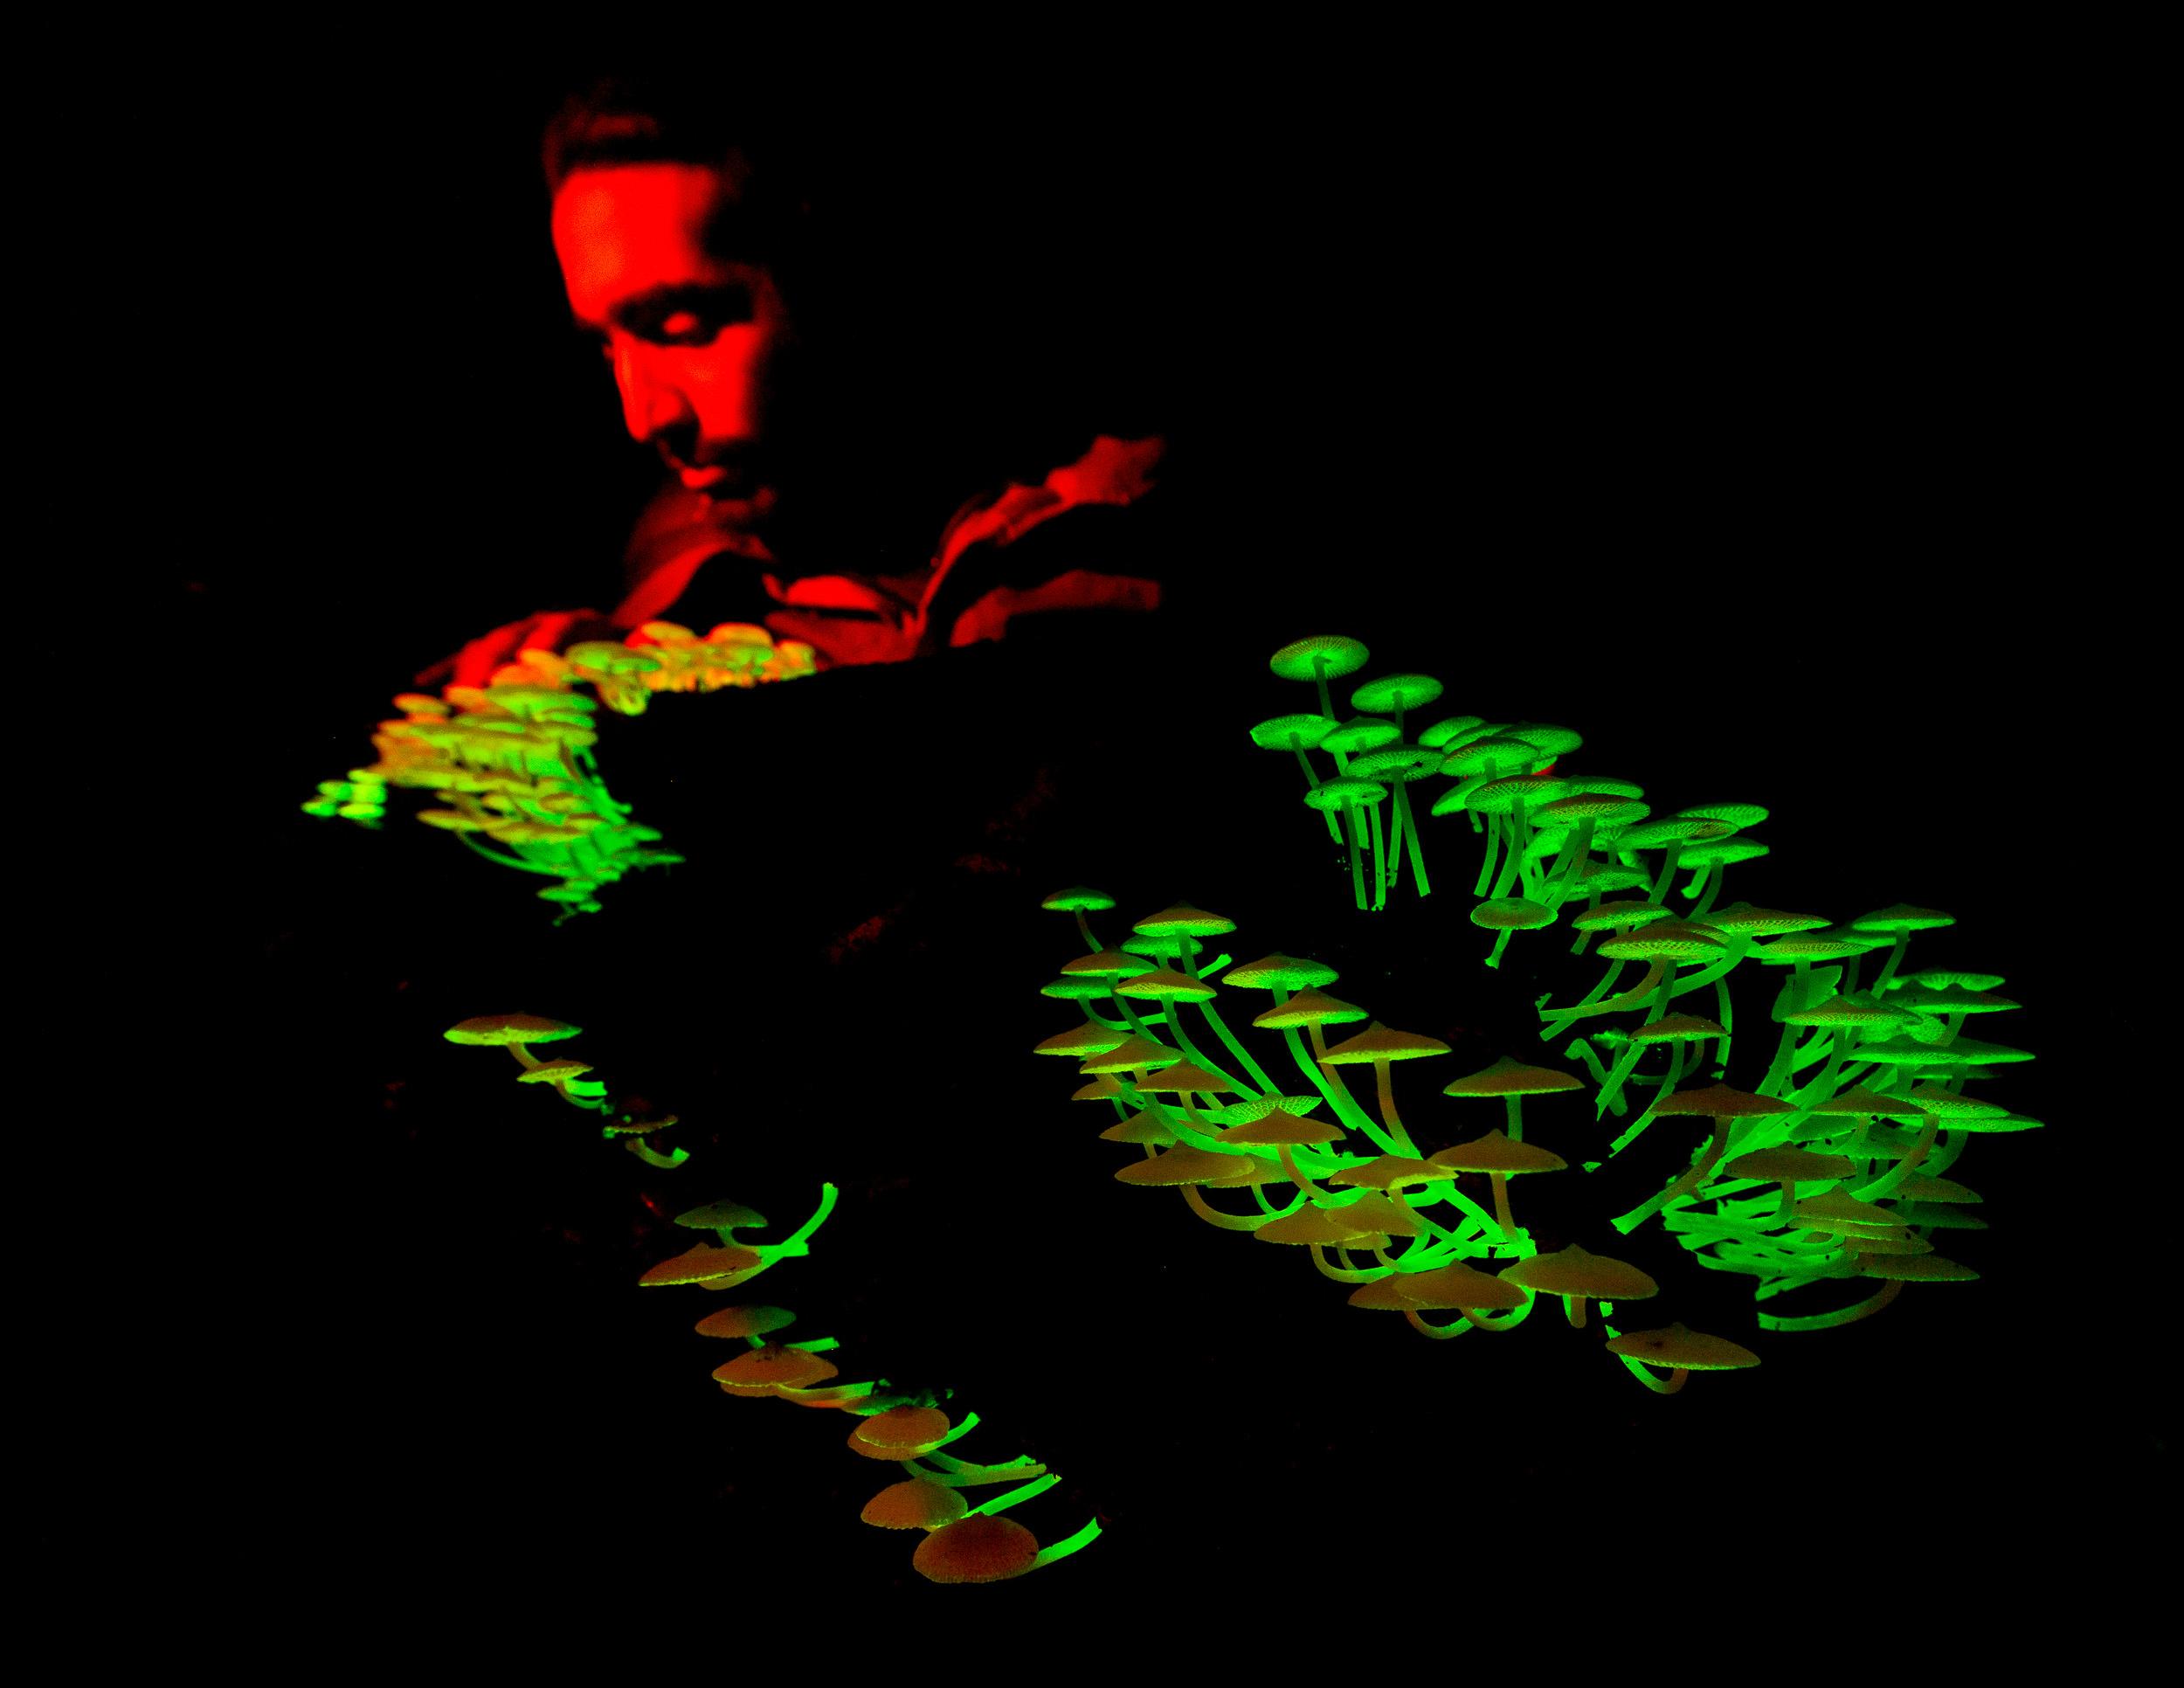 Mycologist Luis Morgado studies a  Filoboletus  fungus that glows in the dark in the Crocker Range, Borneo